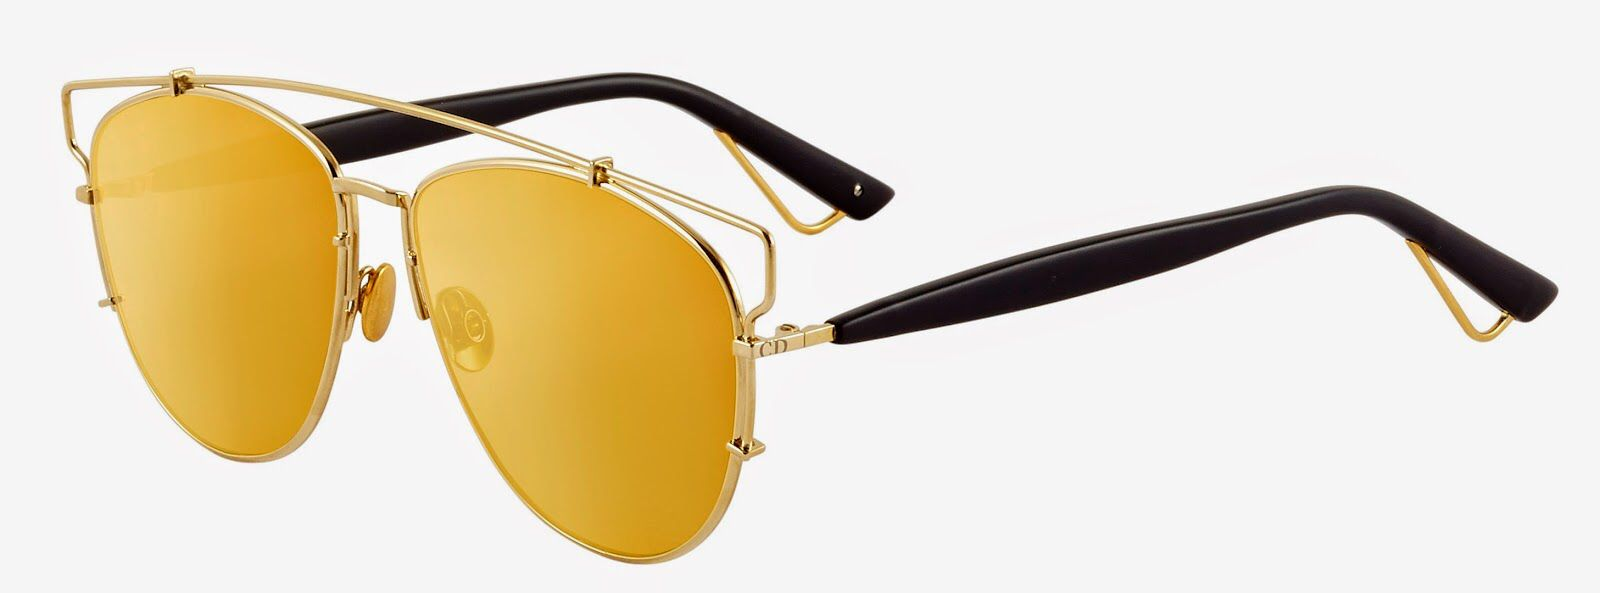 e79c8bac5 Dior Technologic Gold ♥ #sunglasses #love #glamour #brilho #oticas #wanny